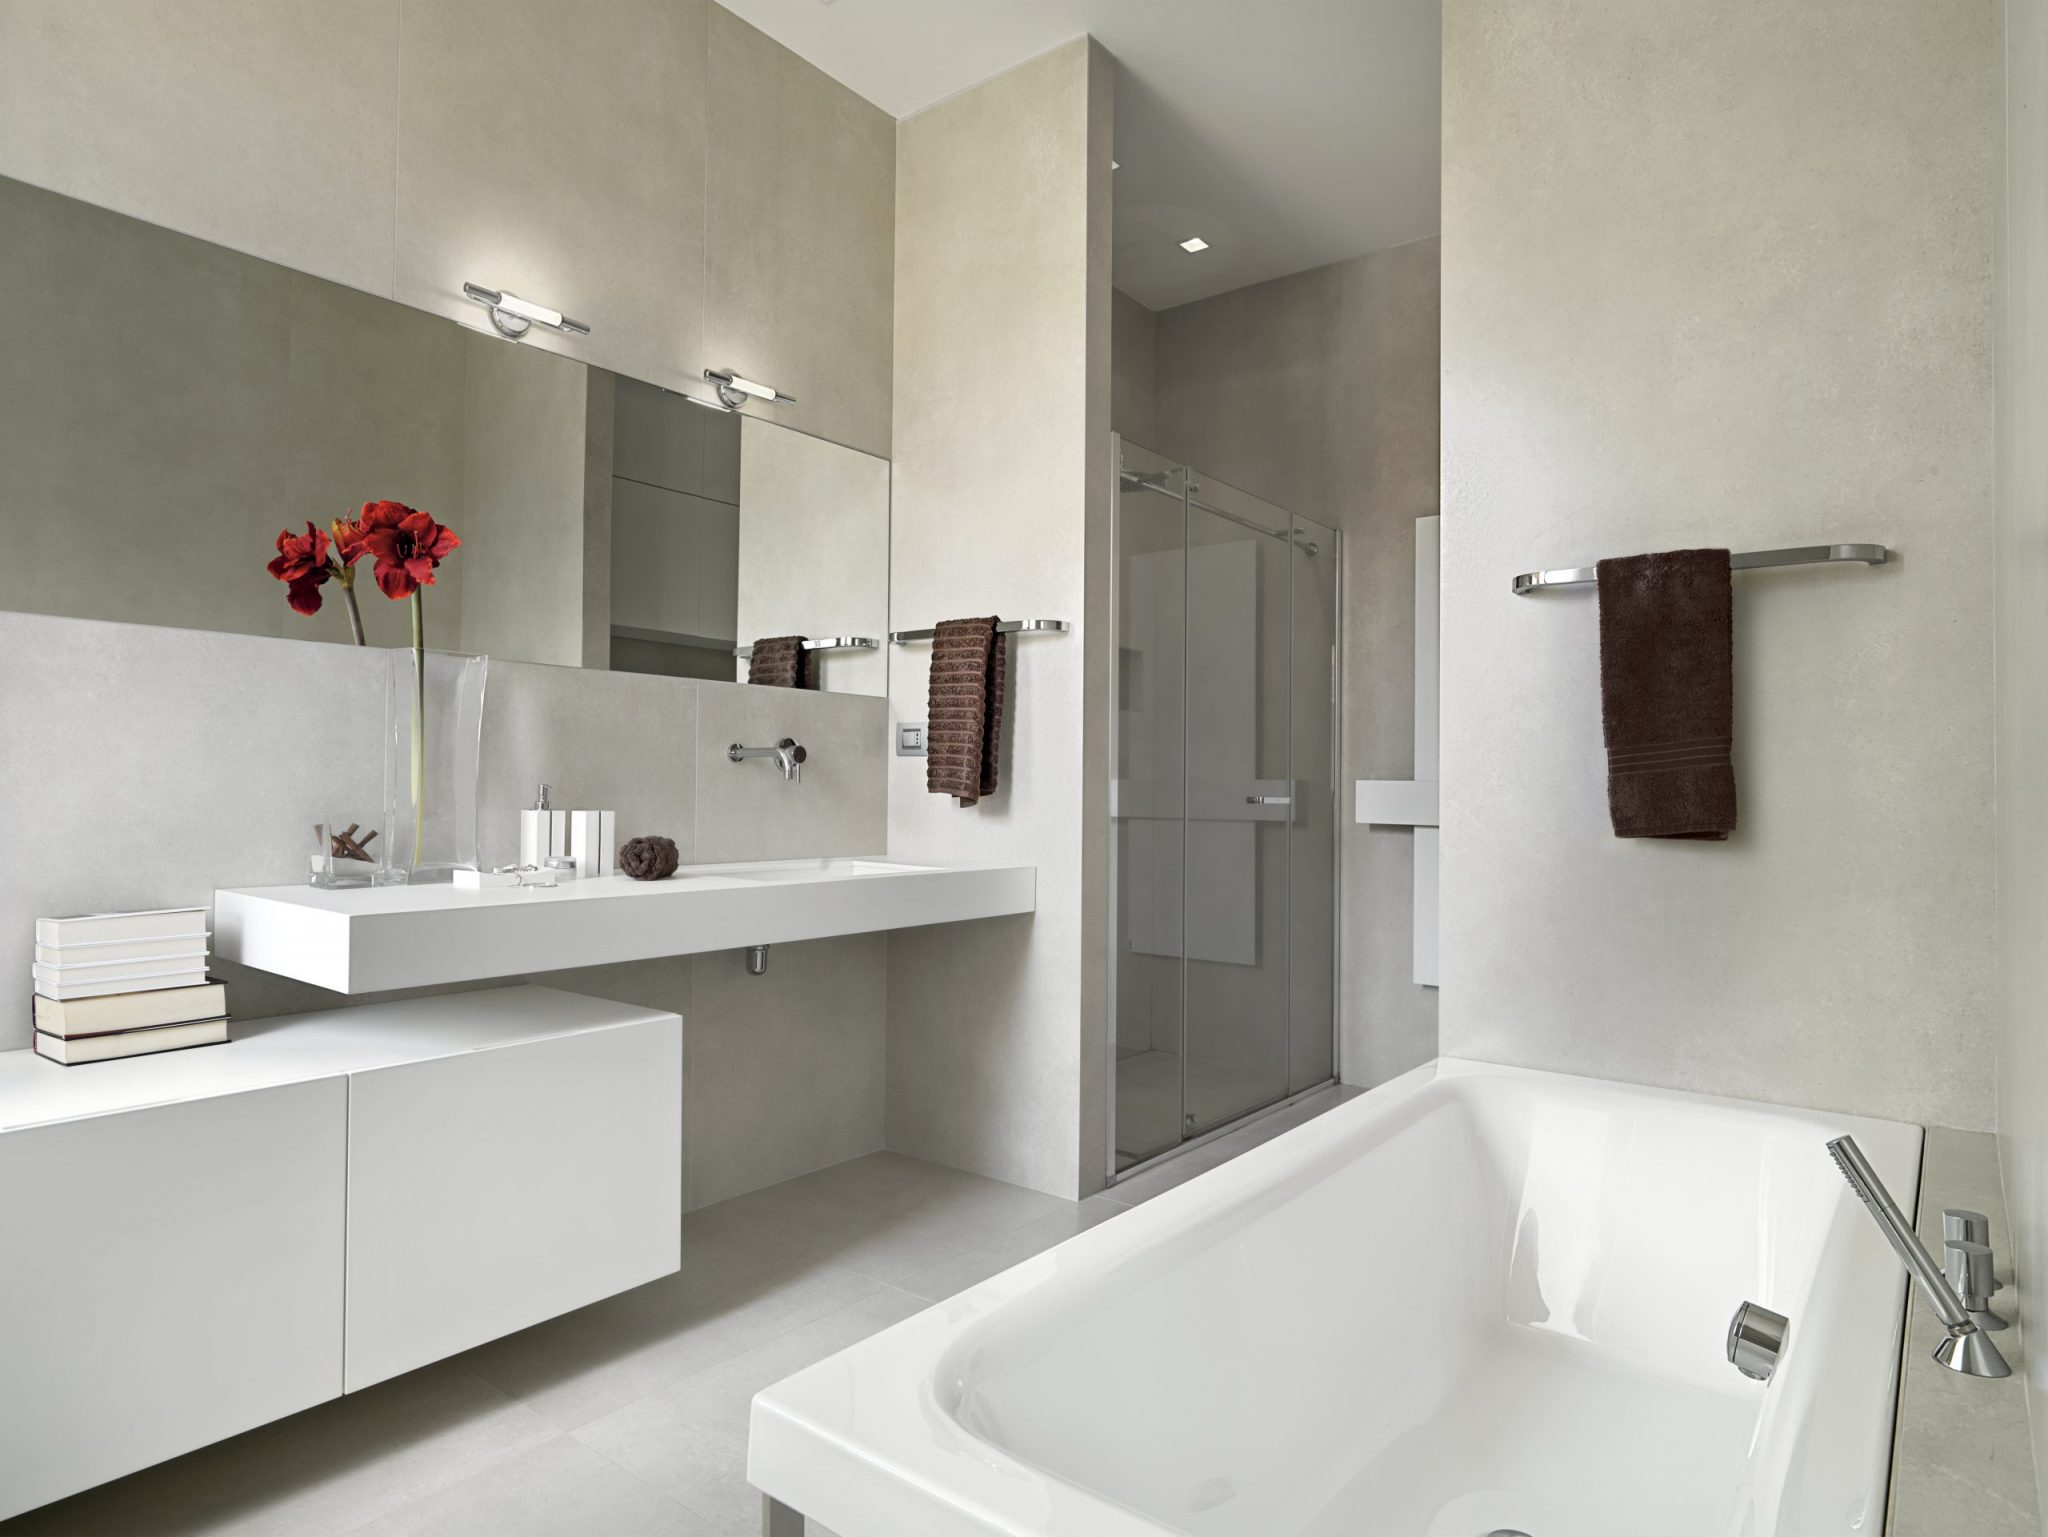 interiors of the modern bathroom 5KC6AV3 scaled - Epoxy Flooring